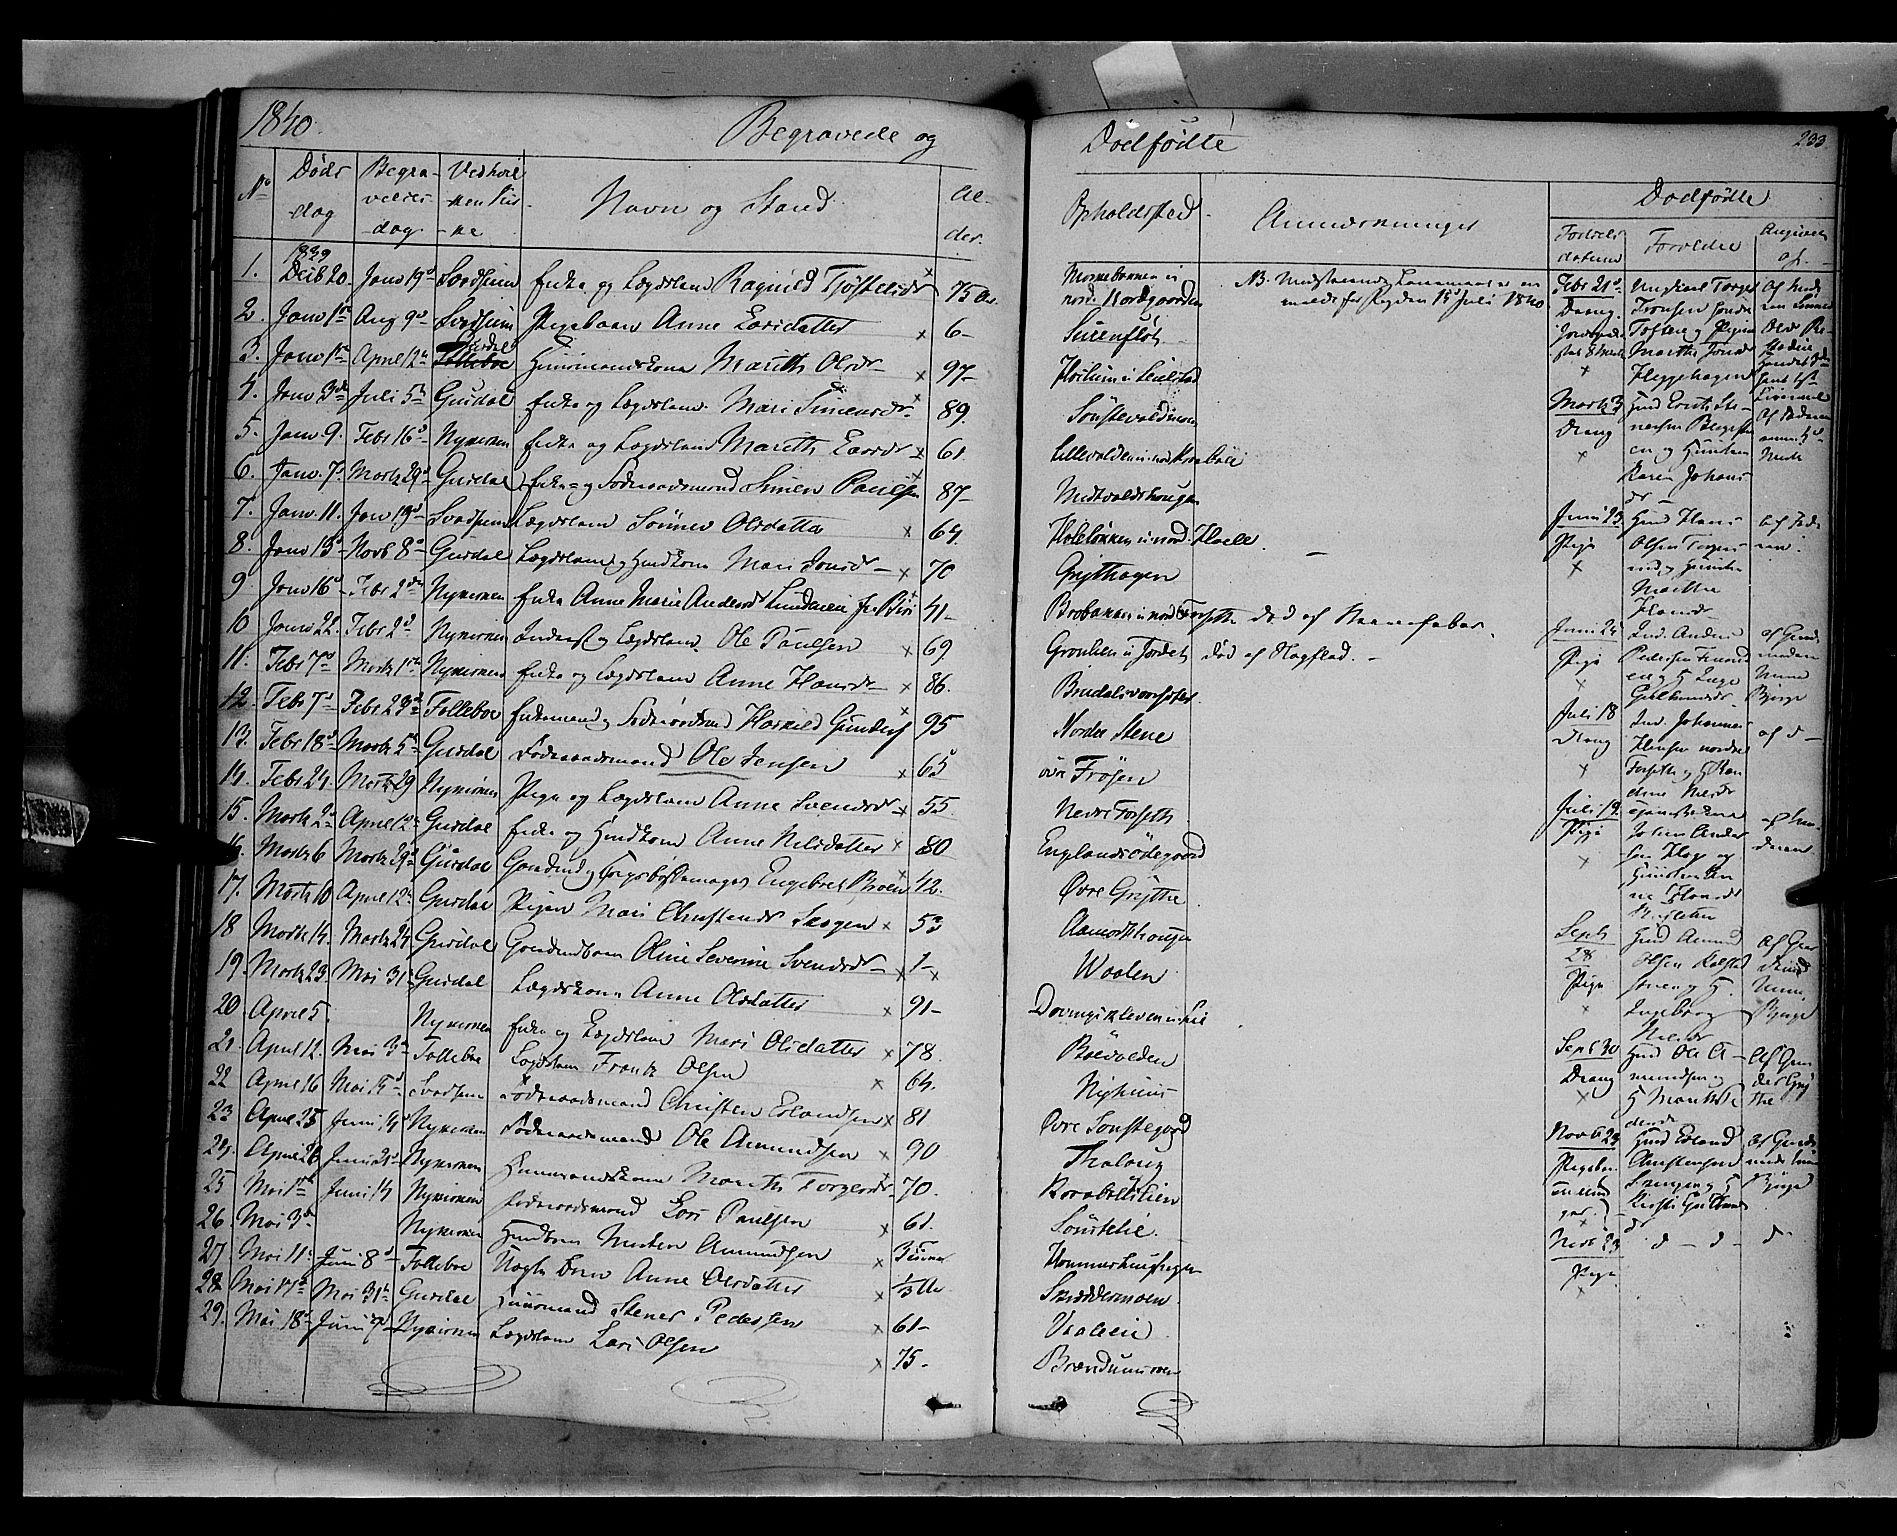 SAH, Gausdal prestekontor, Ministerialbok nr. 7, 1840-1850, s. 233